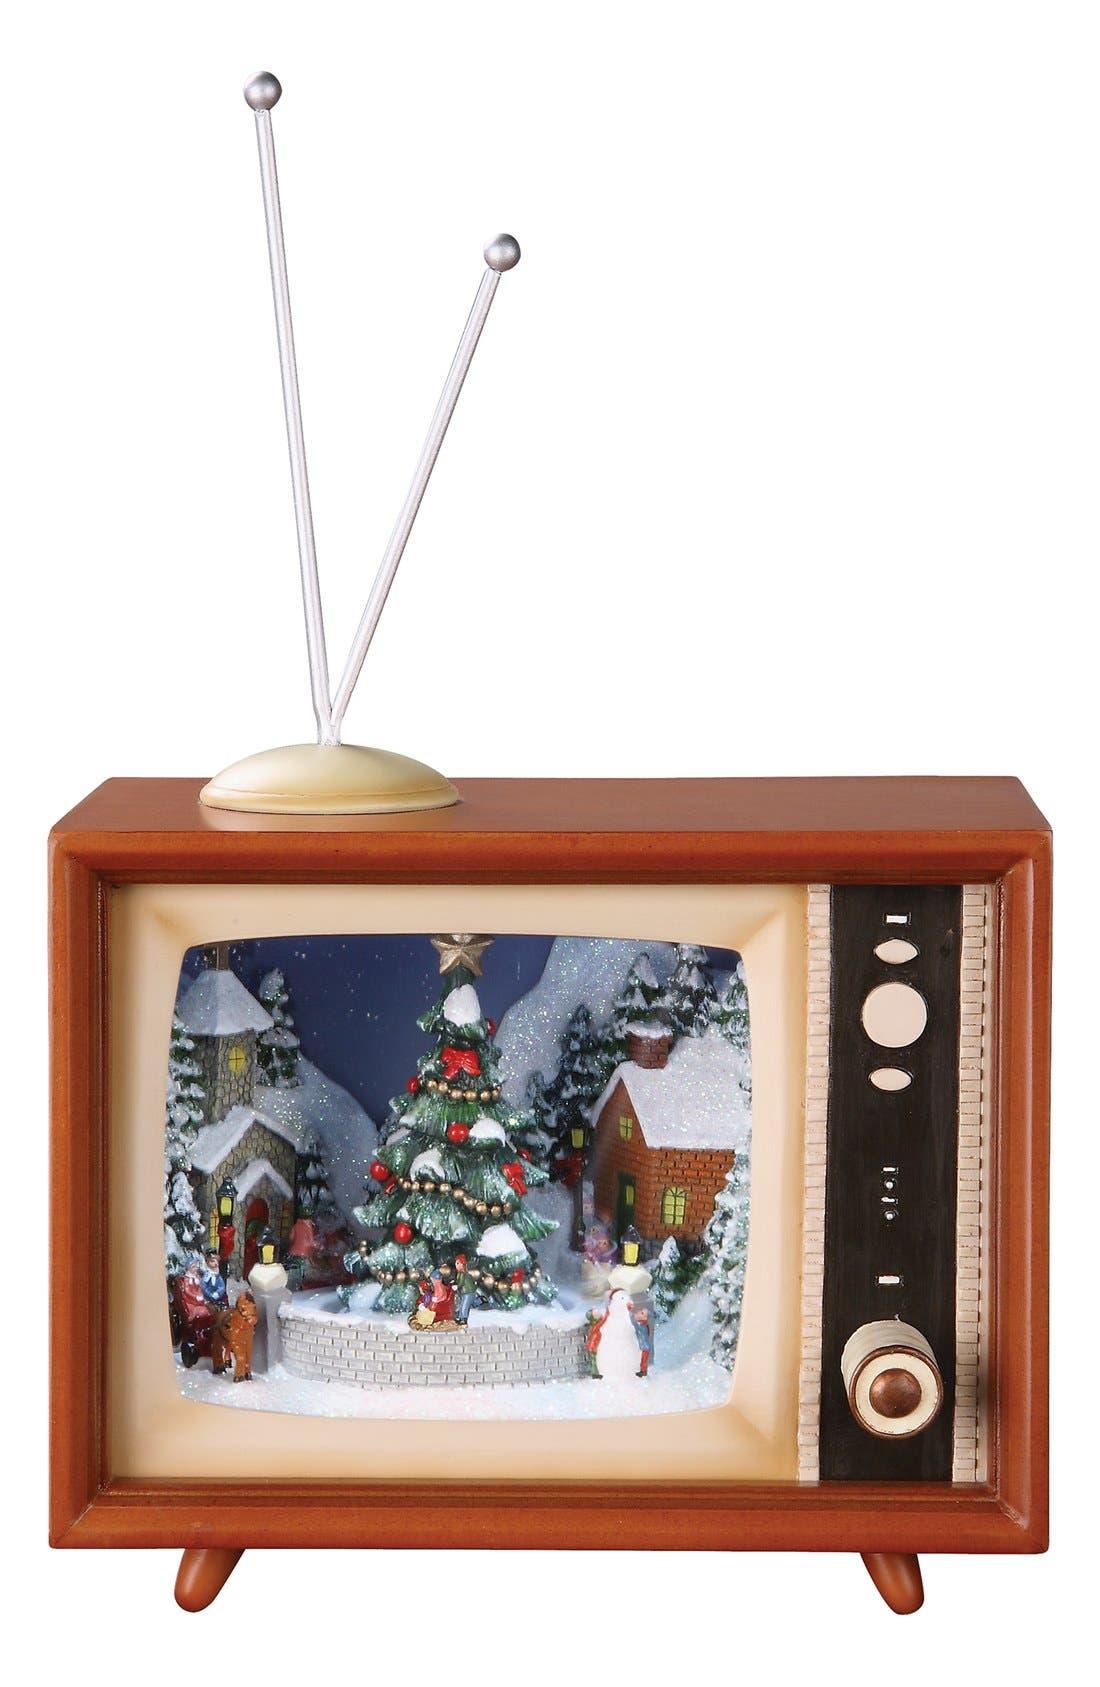 'Sledders' LED Musical TV Decoration,                             Main thumbnail 1, color,                             BROWN/ MULTI